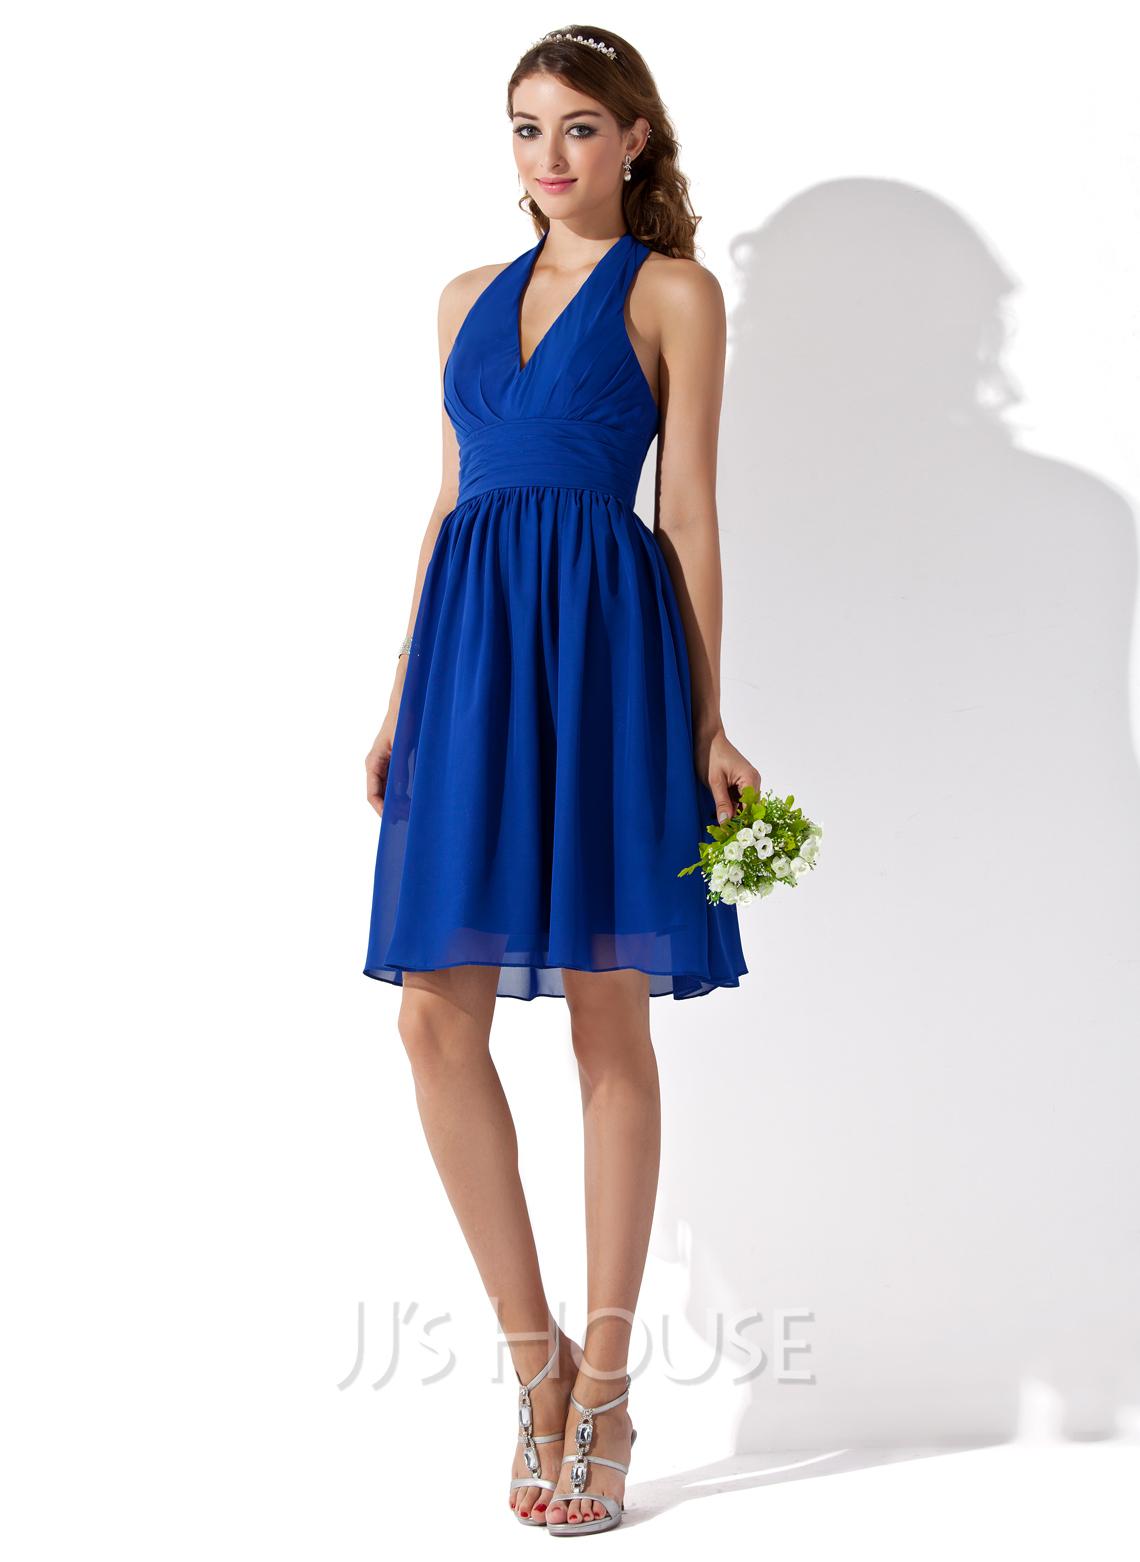 A-Line/Princess Halter Knee-Length Chiffon Bridesmaid Dress With Ruffle